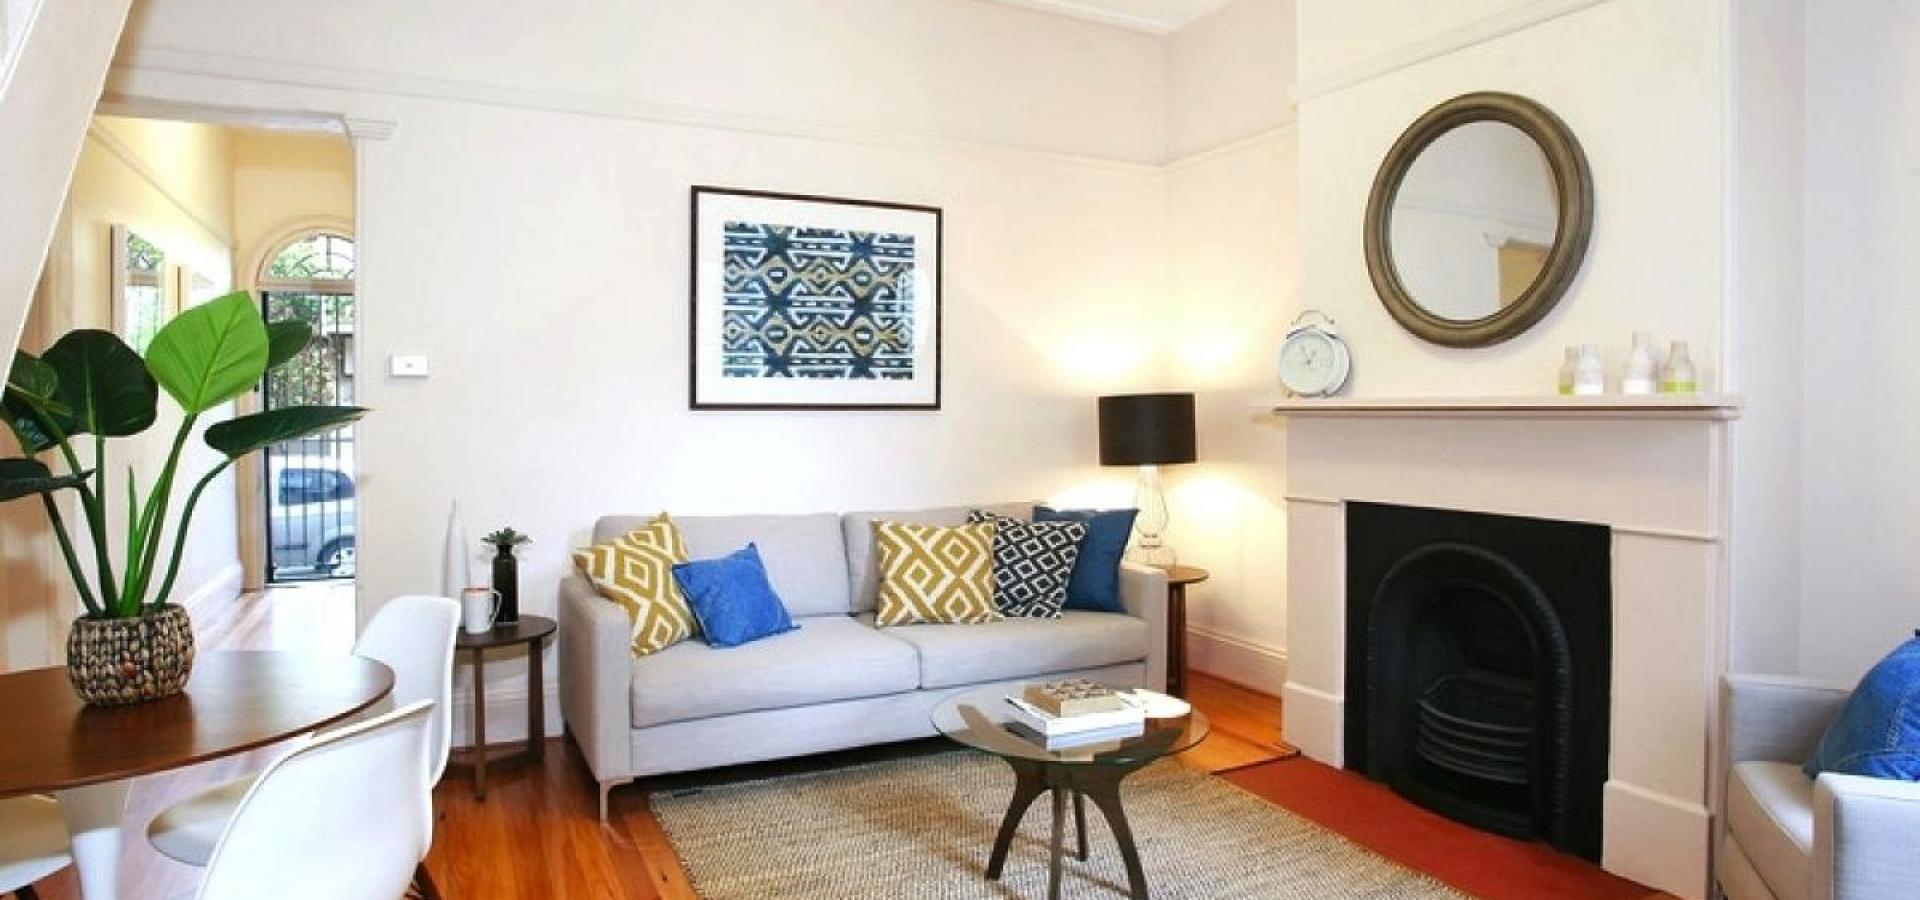 Elegant Dual Level Terrace In Desirable Location